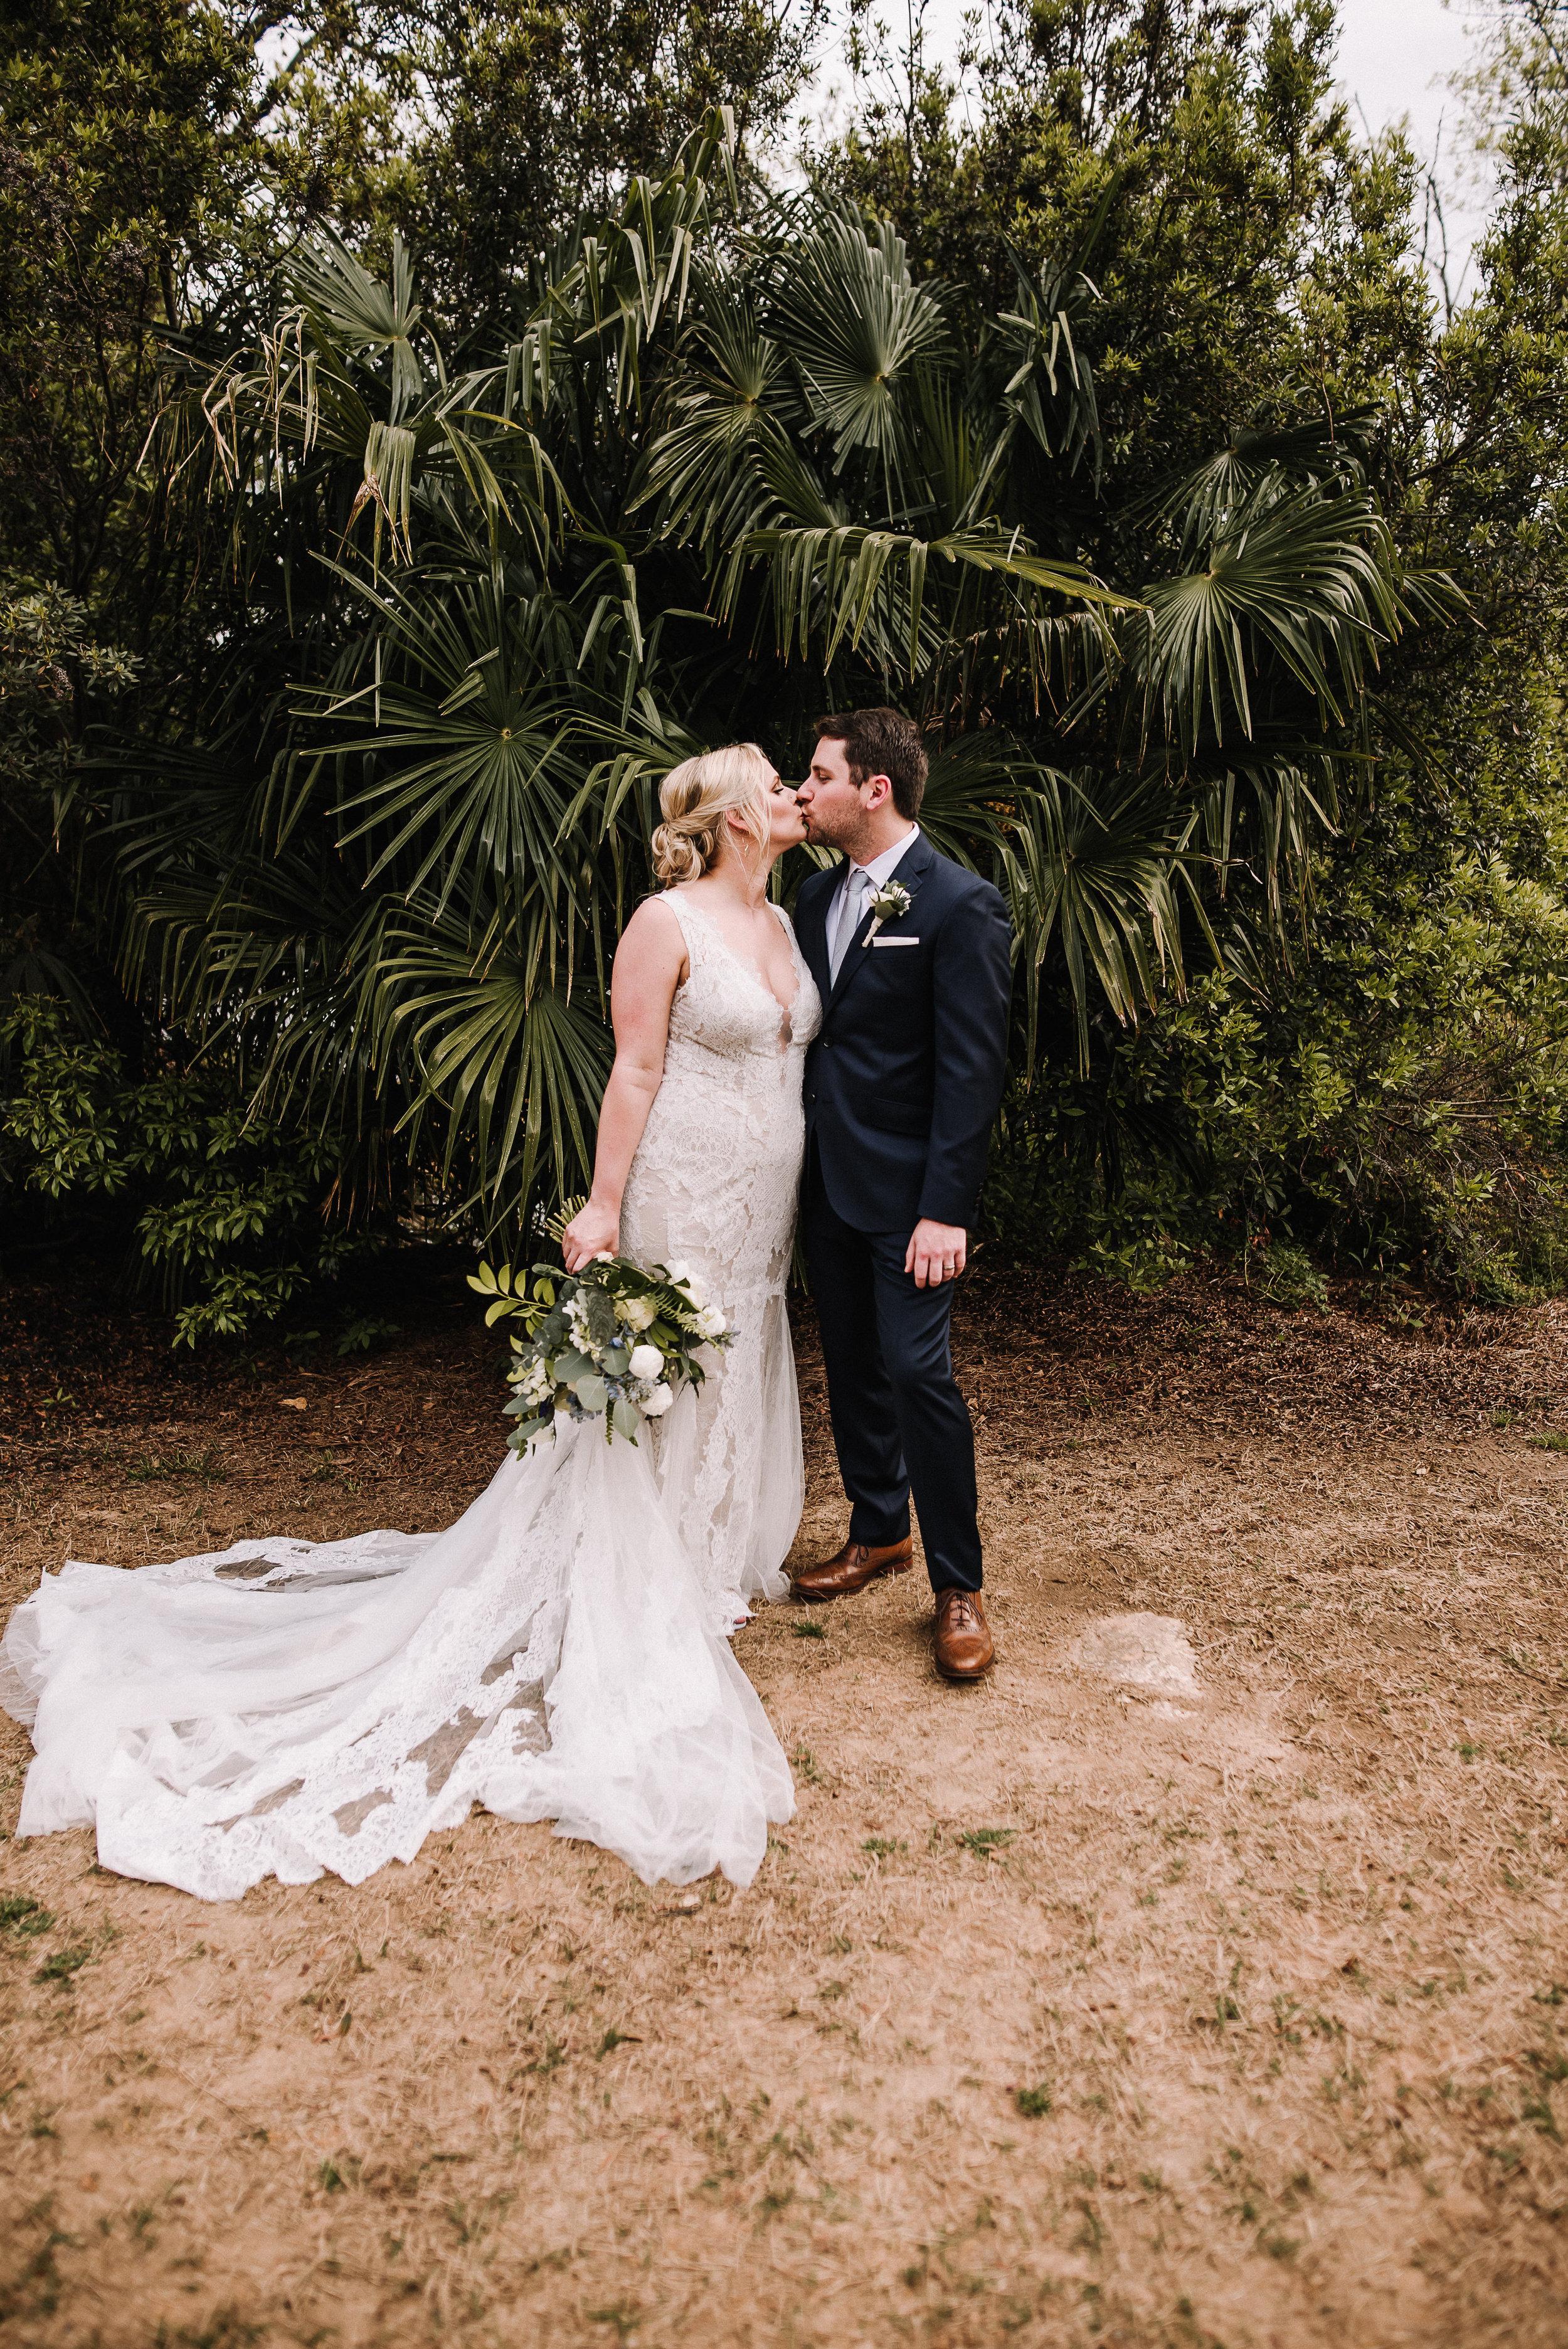 Morgan Wedding_Mill at Yellow River_Ashley Benham Photography-833.jpg